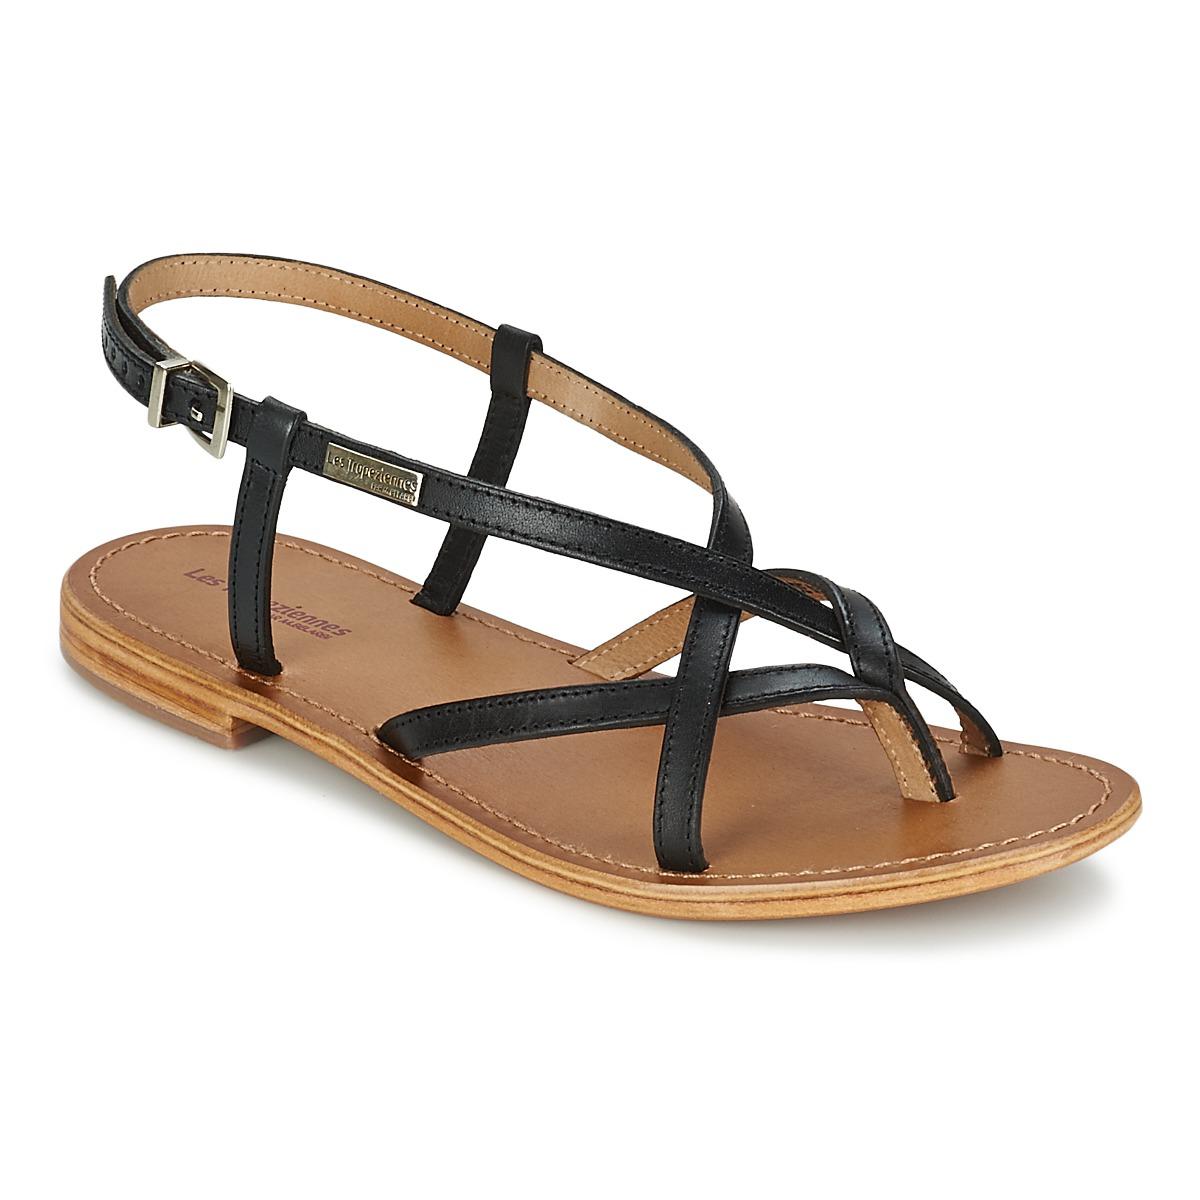 les trop ziennes par m belarbi hiboux black free delivery with spartoo uk shoes sandals. Black Bedroom Furniture Sets. Home Design Ideas